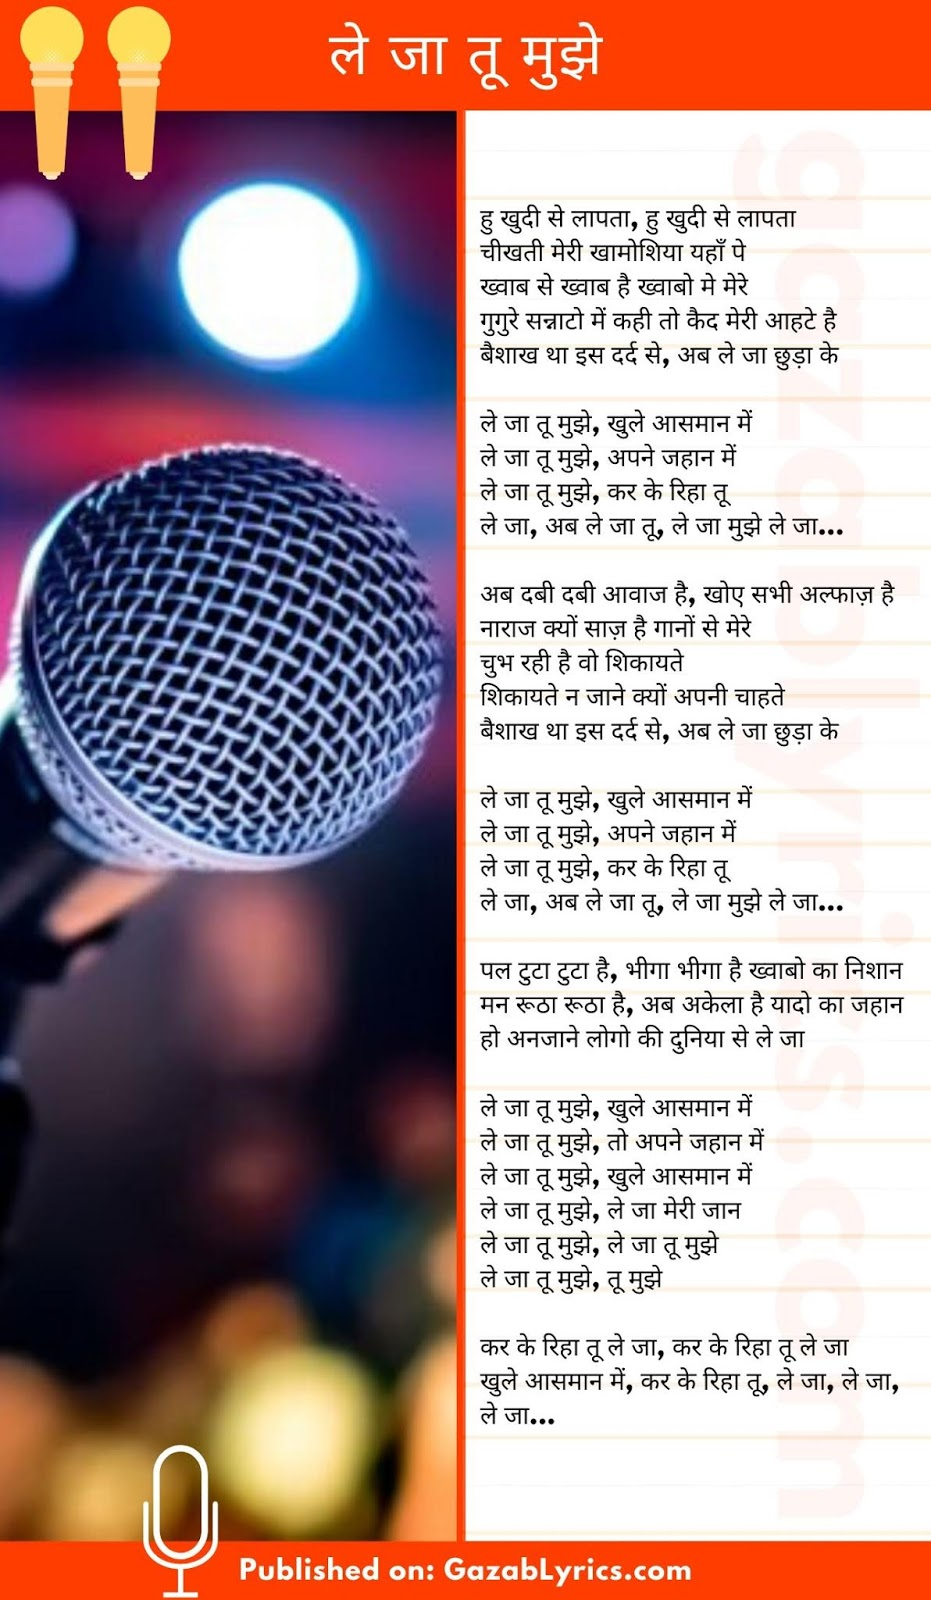 Le Ja Tu Mujhe song lyrics image